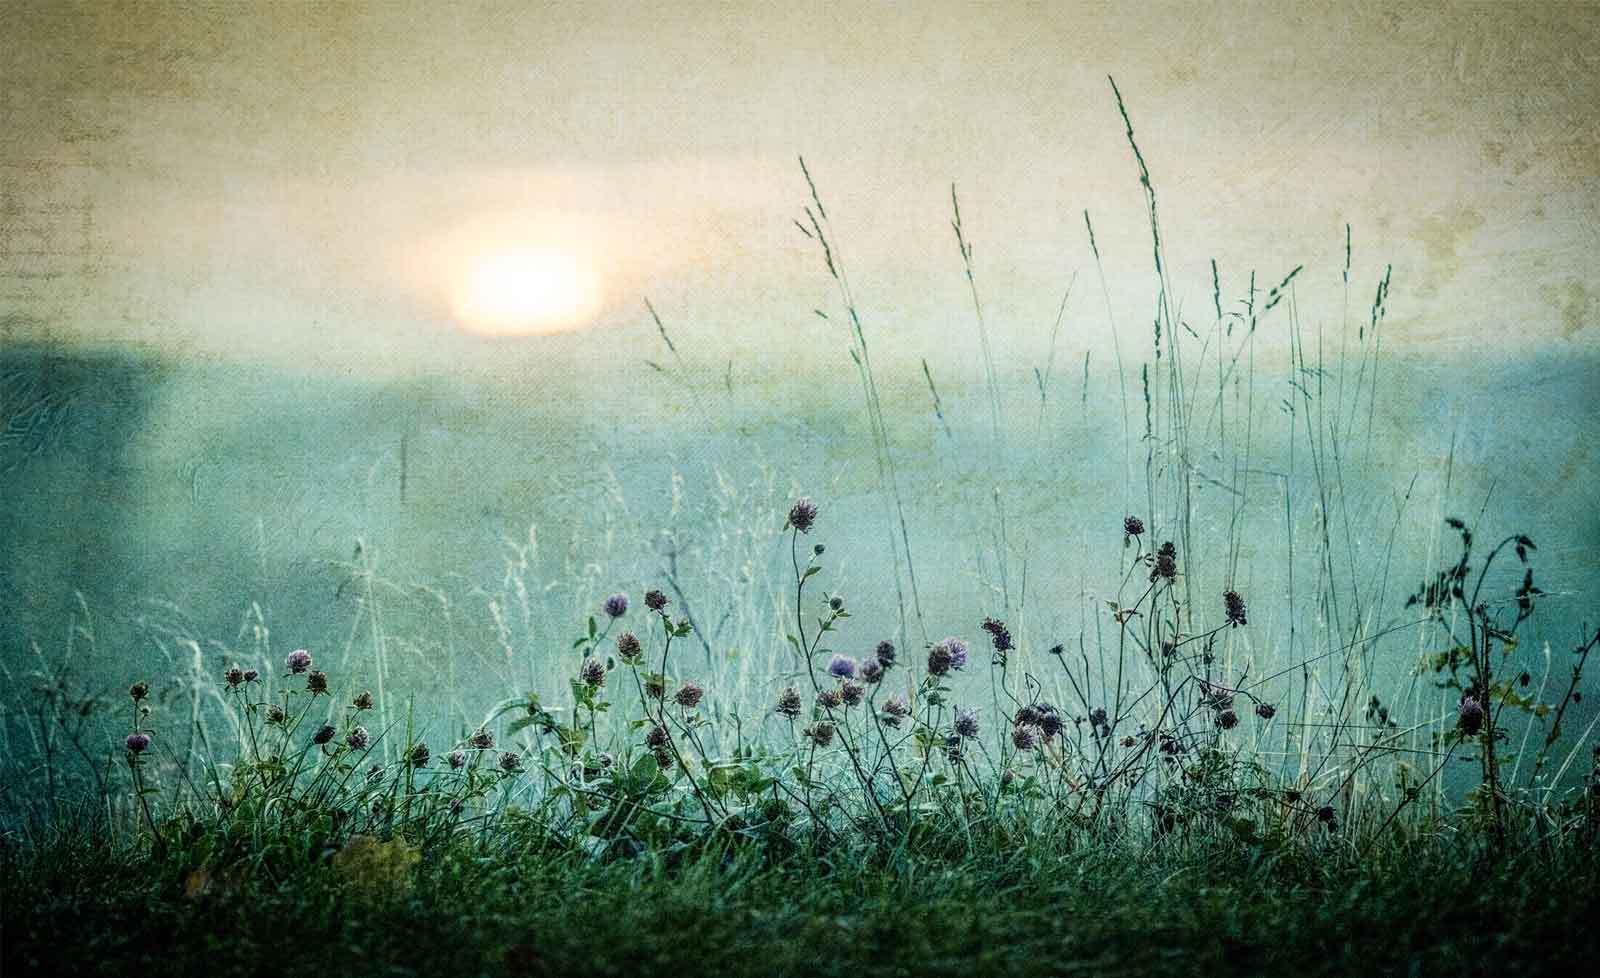 WALL MURAL PHOTO WALLPAPER XXL Grassland Meadow Field Flowers Grass (1X-1026605W